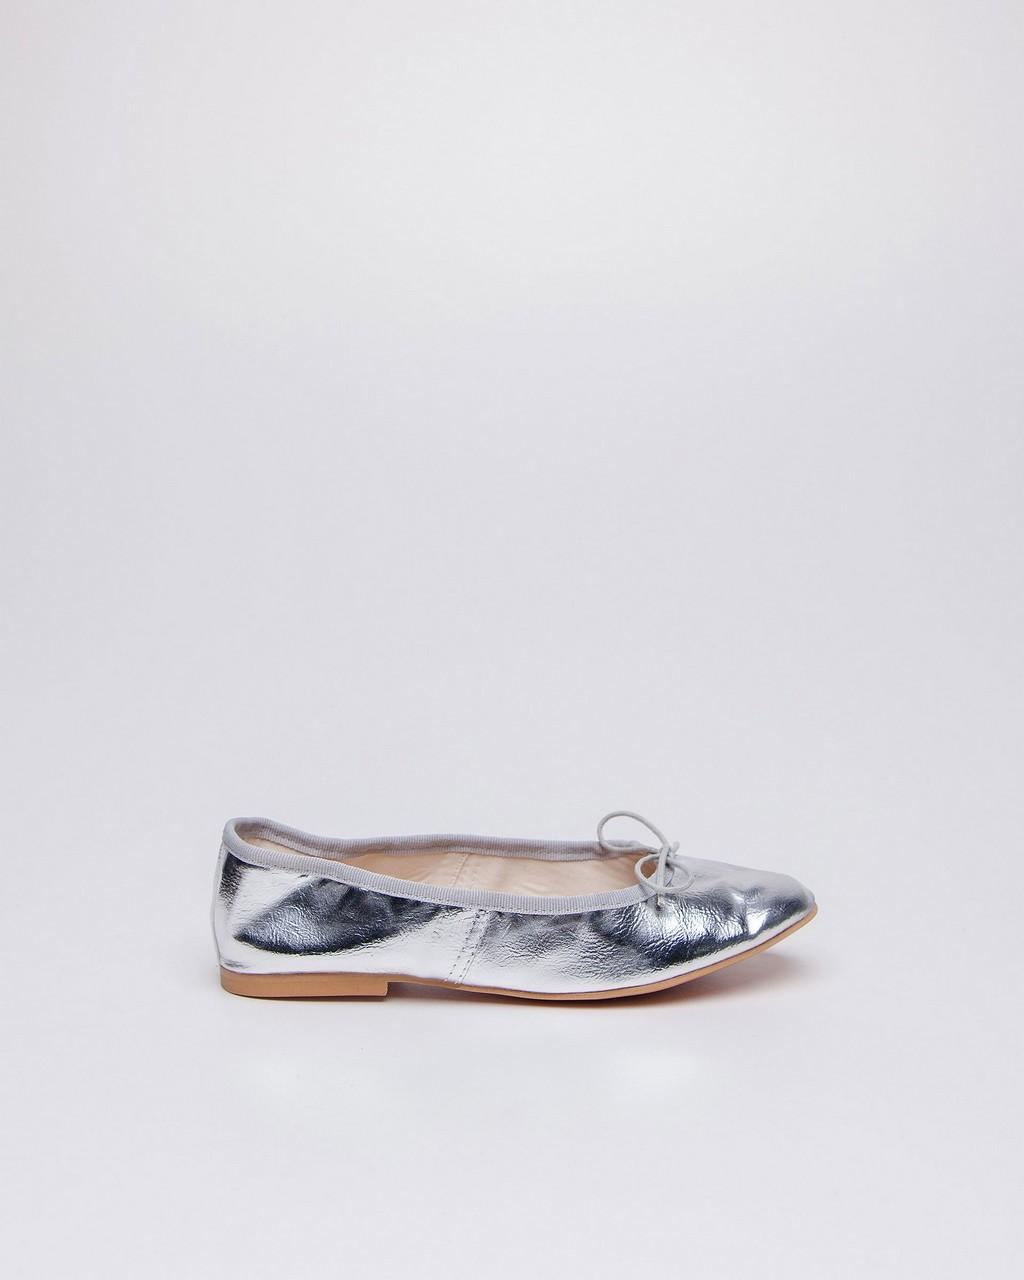 Tagtraume E.Ballerina - Silver(실버)